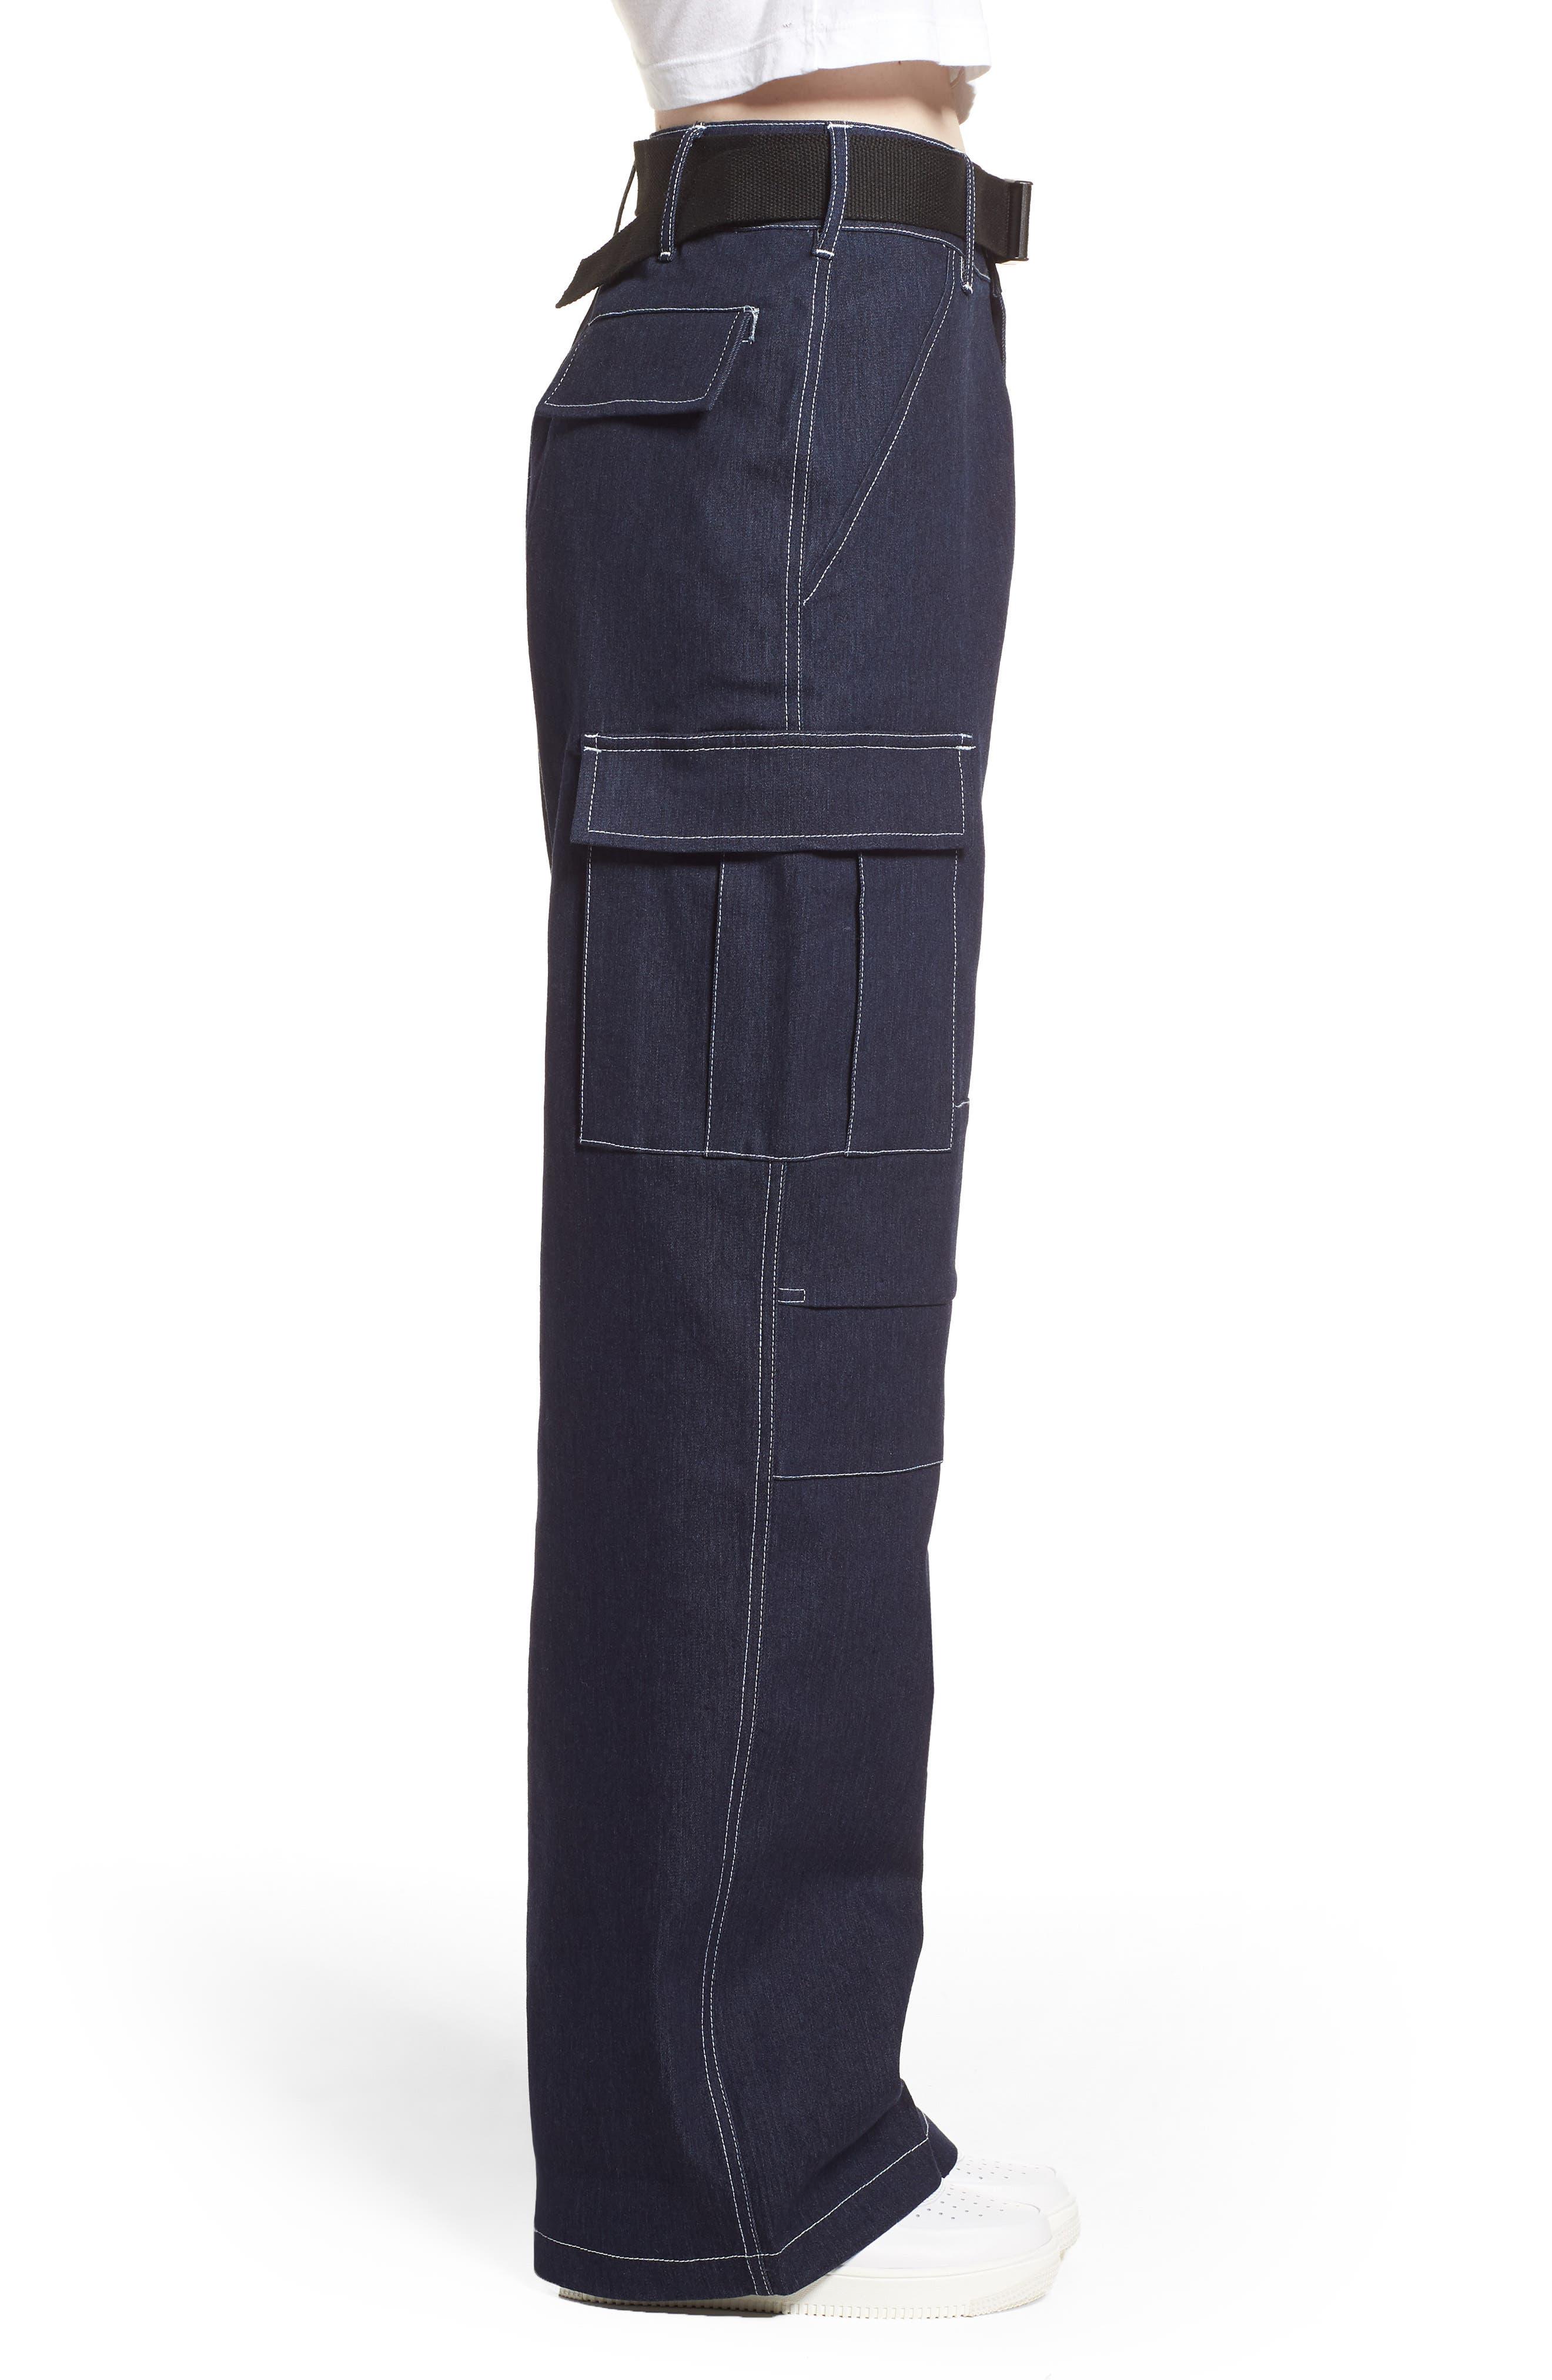 I.AM.GIA Ace Cargo Jeans,                             Alternate thumbnail 3, color,                             DENIM